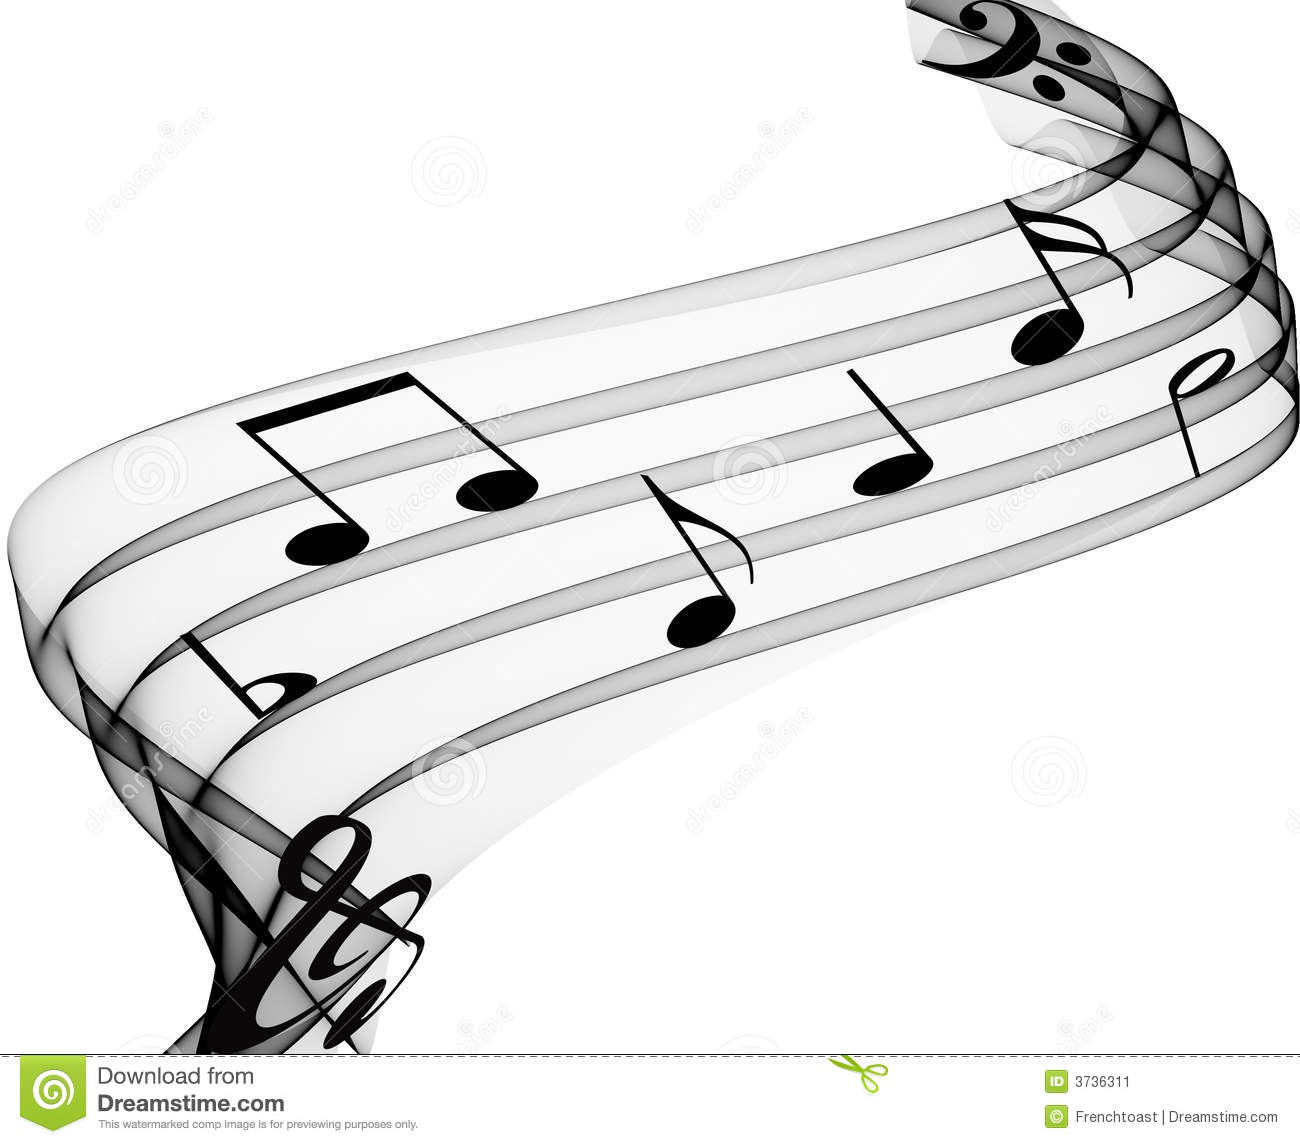 Drawn music notes transparent white Notes Free Clipart music%20notes%20transparent Music